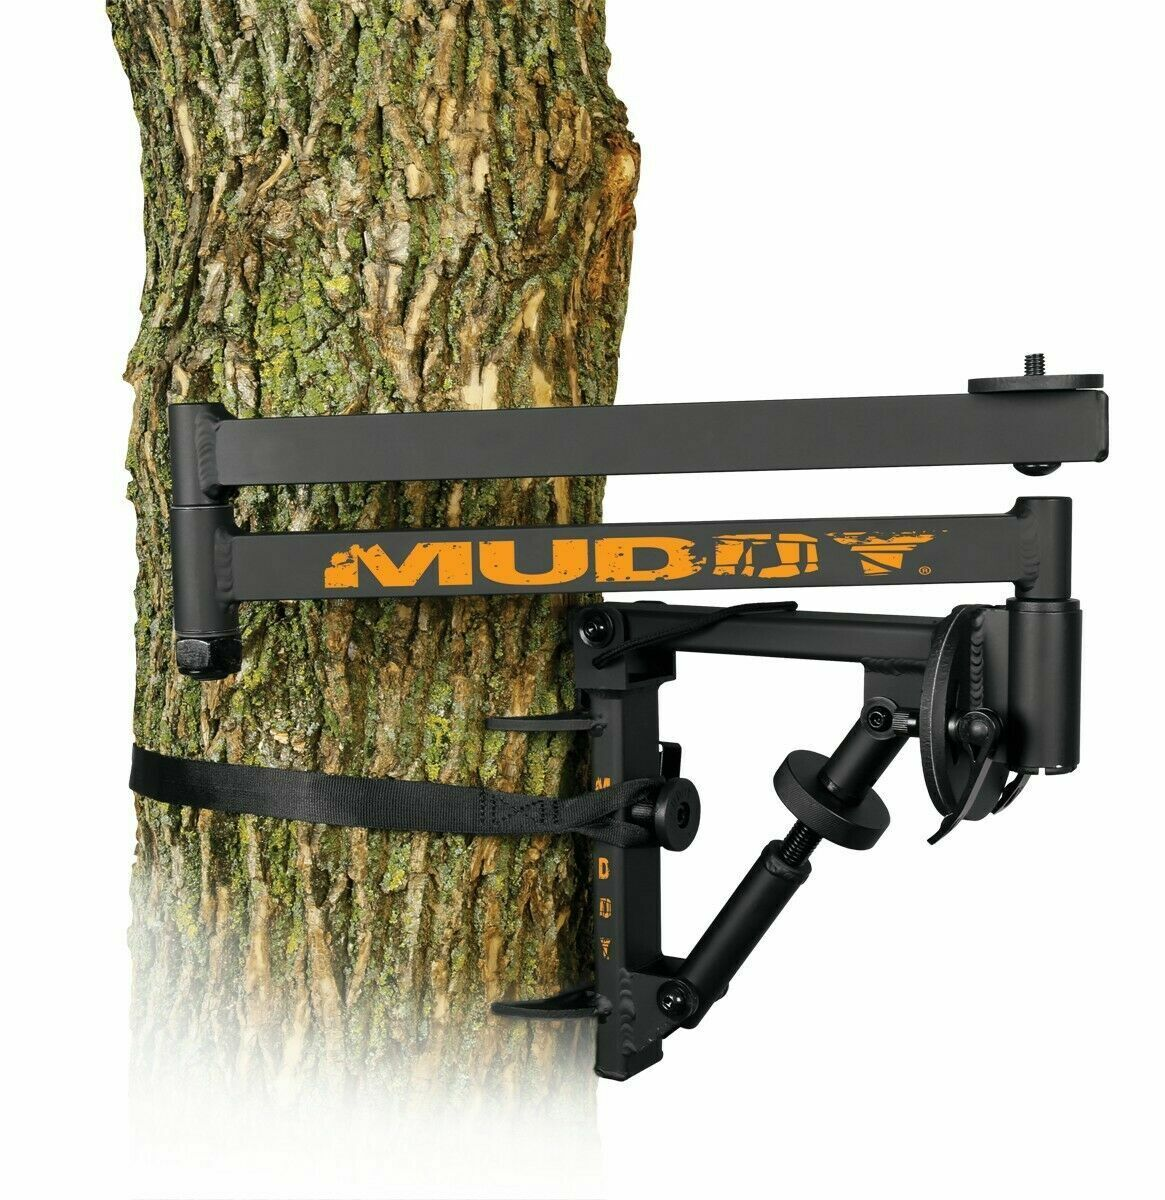 Muddy Outdoors Outfitter Camera Arm MUD-MCA200 Deer Turkey H